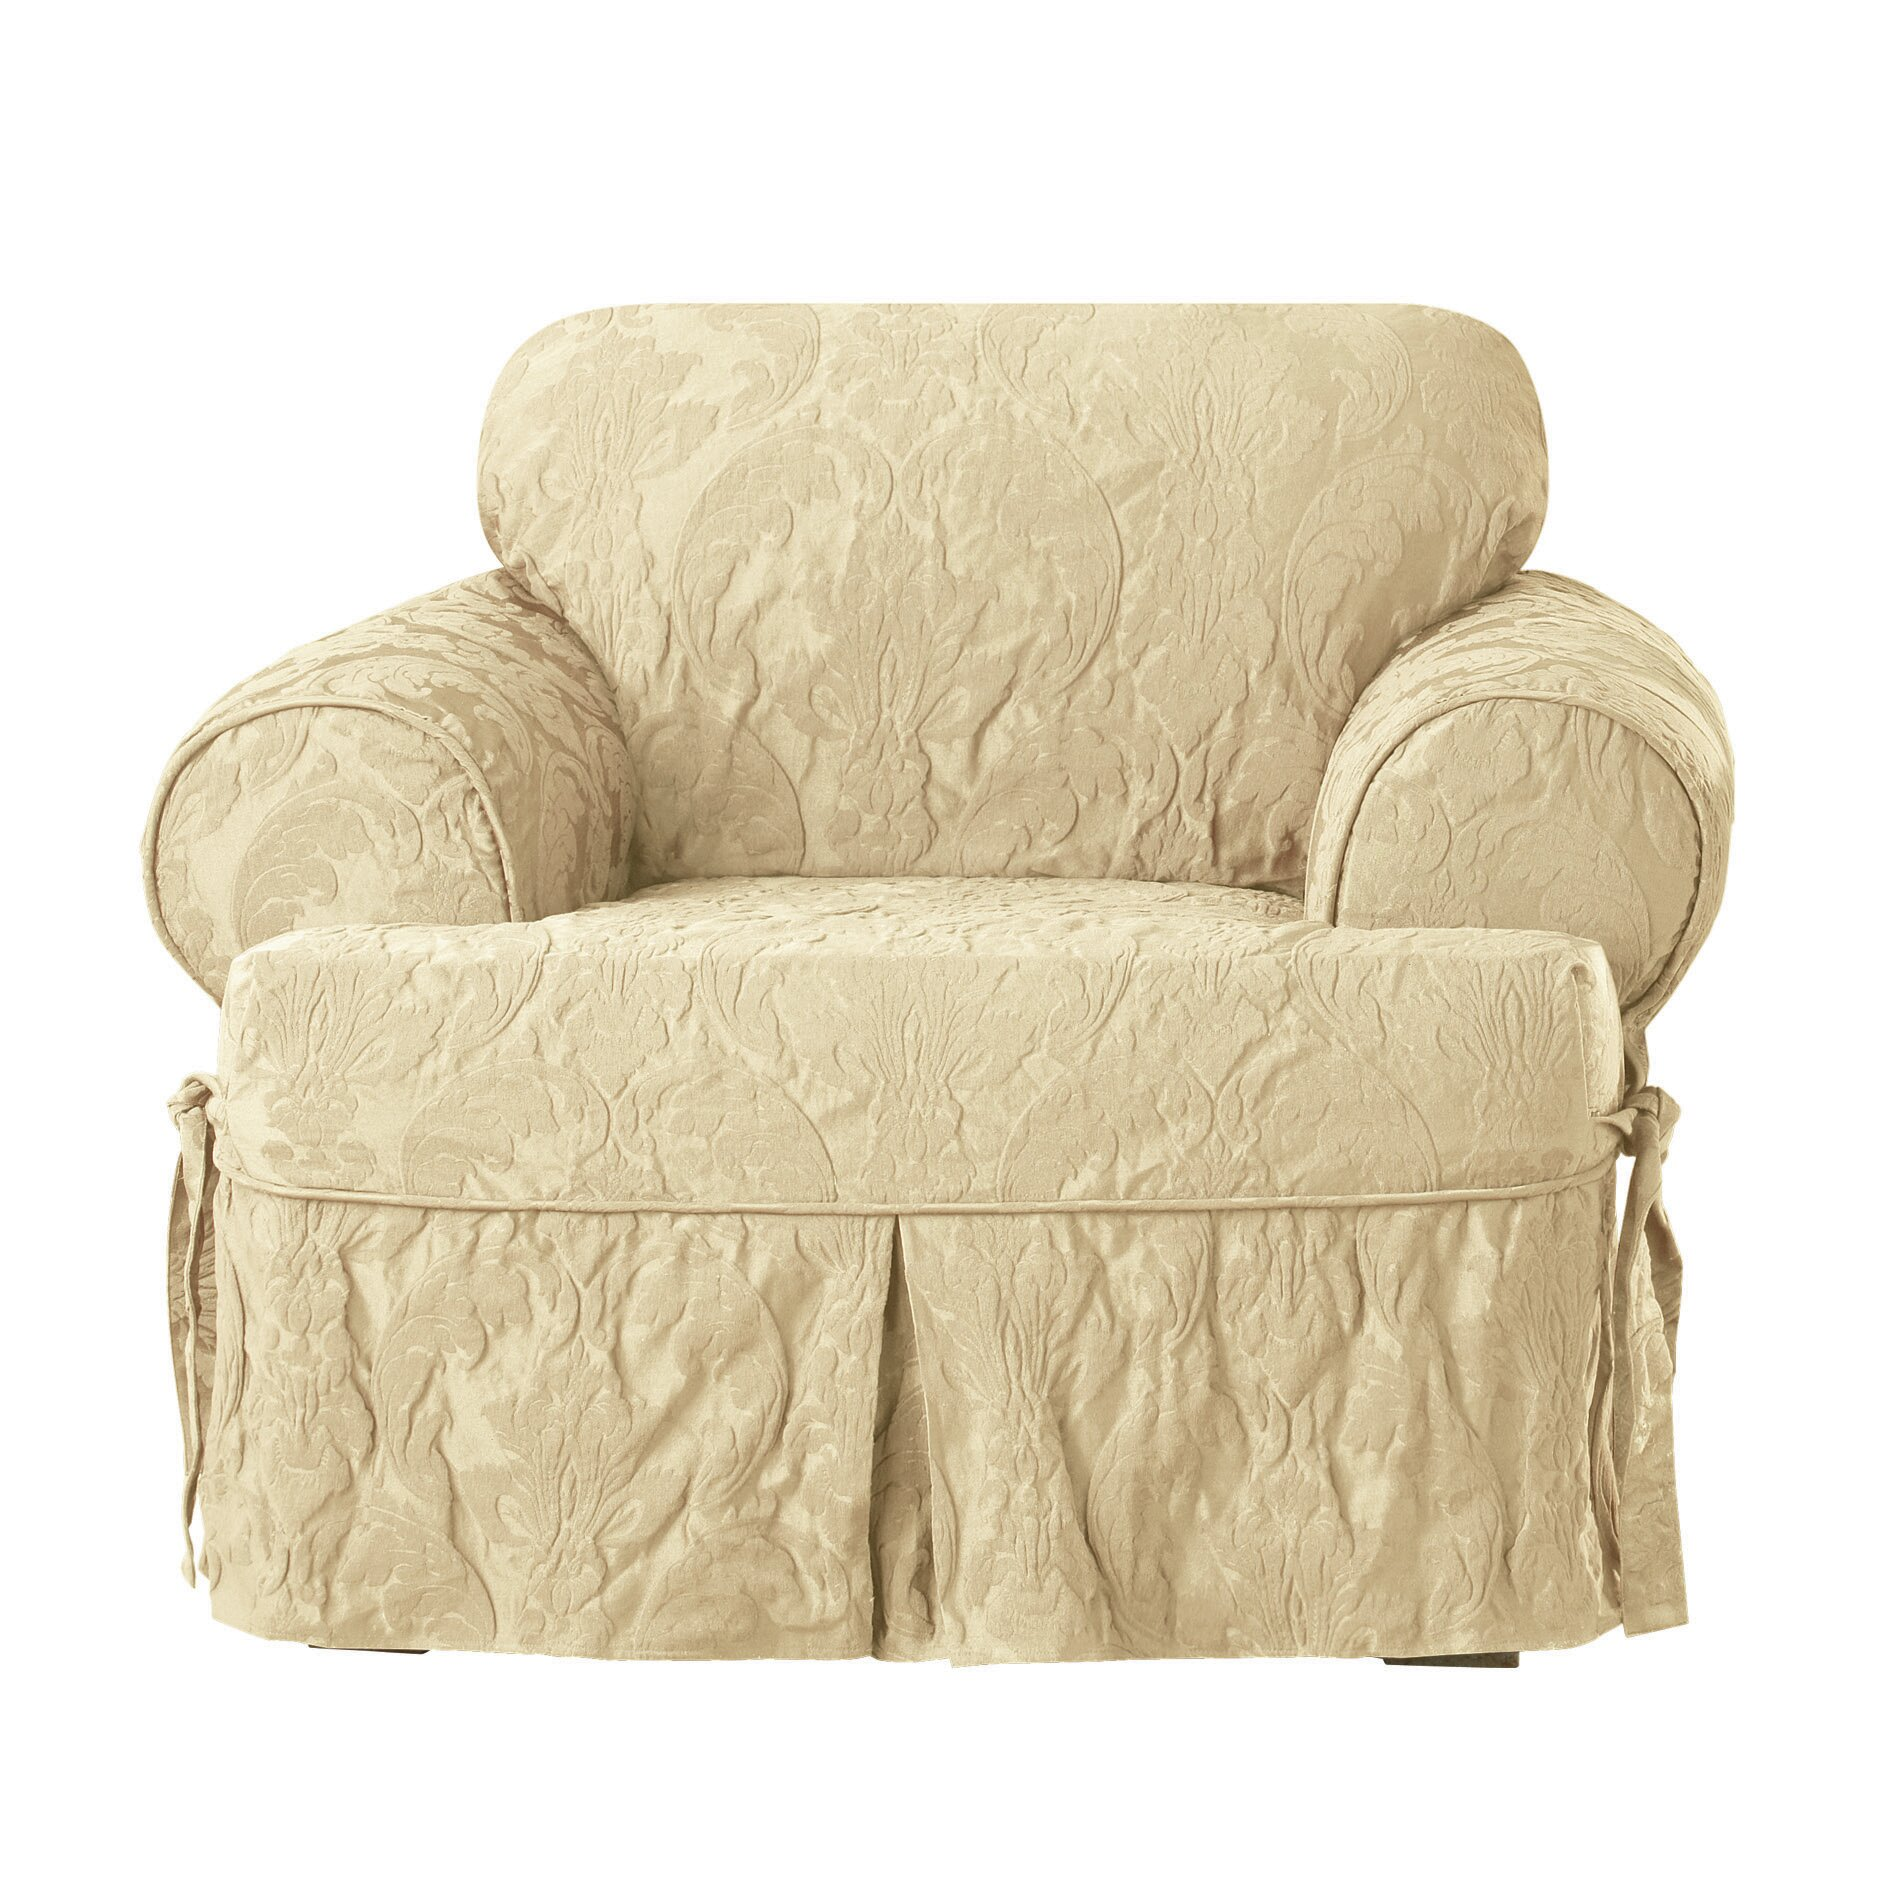 Sure Fit Matelasse Damask Chair T Cushion Slipcover Ebay